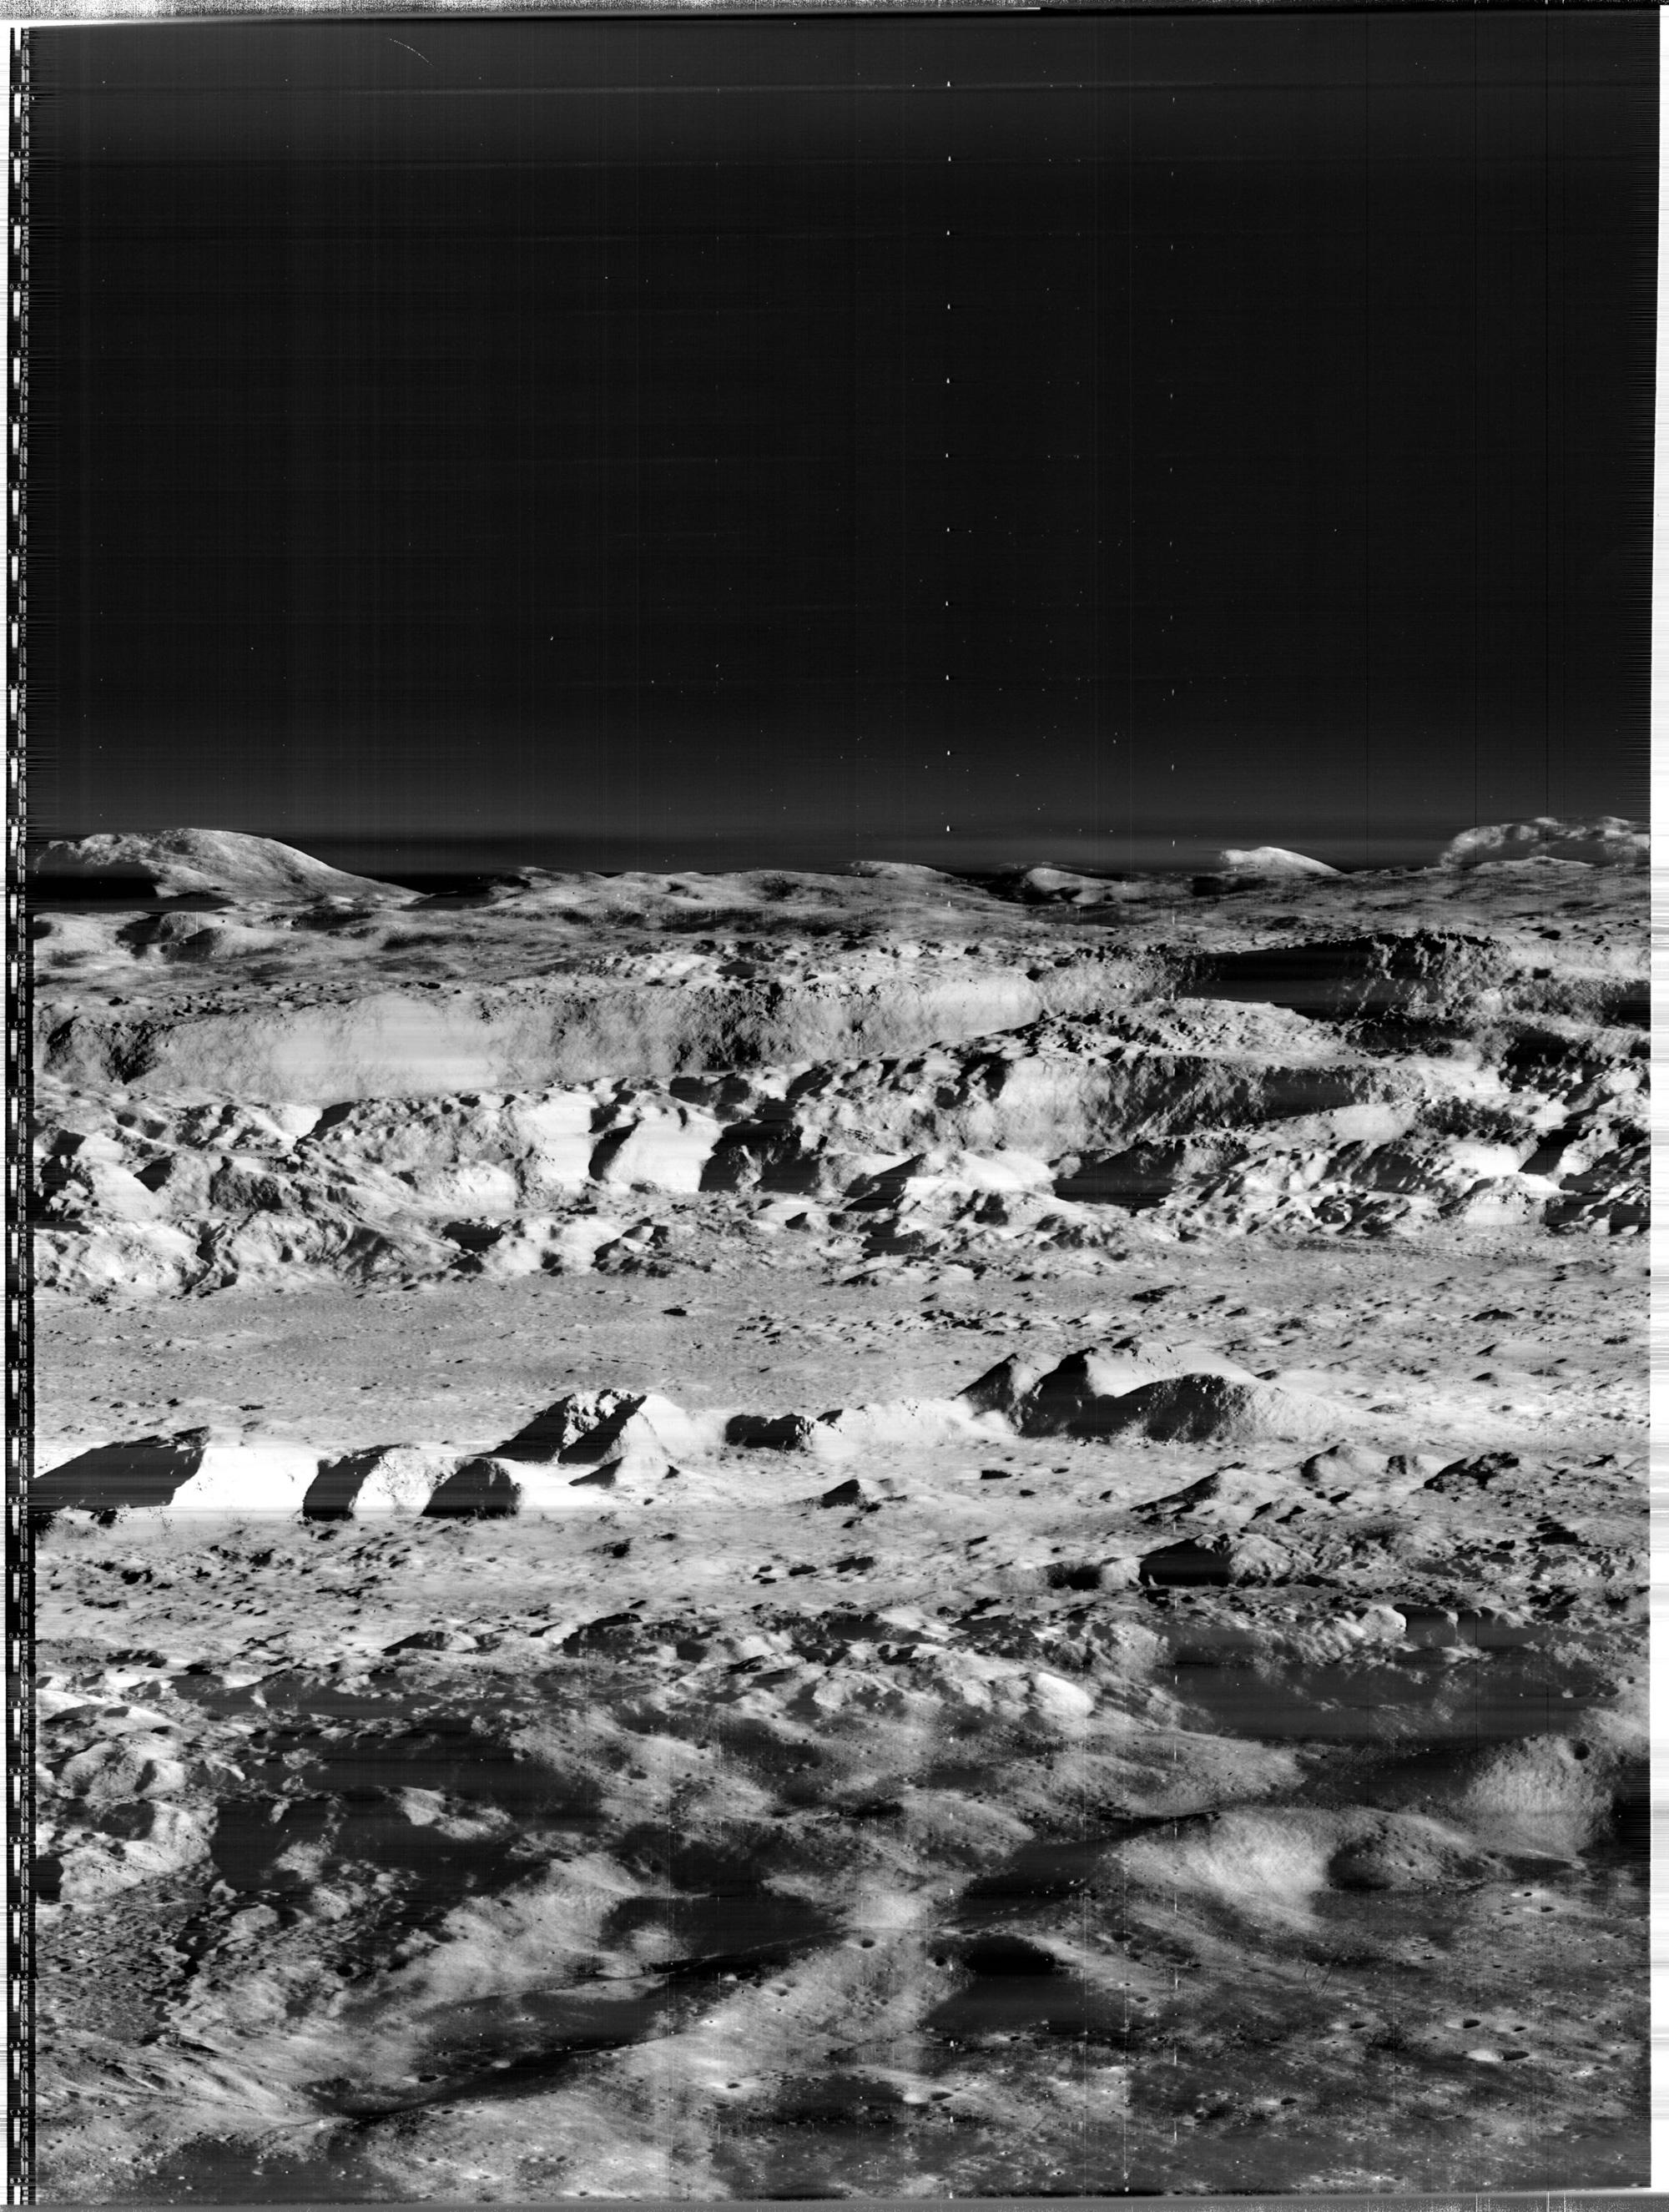 Original Lunar Orbiter Image